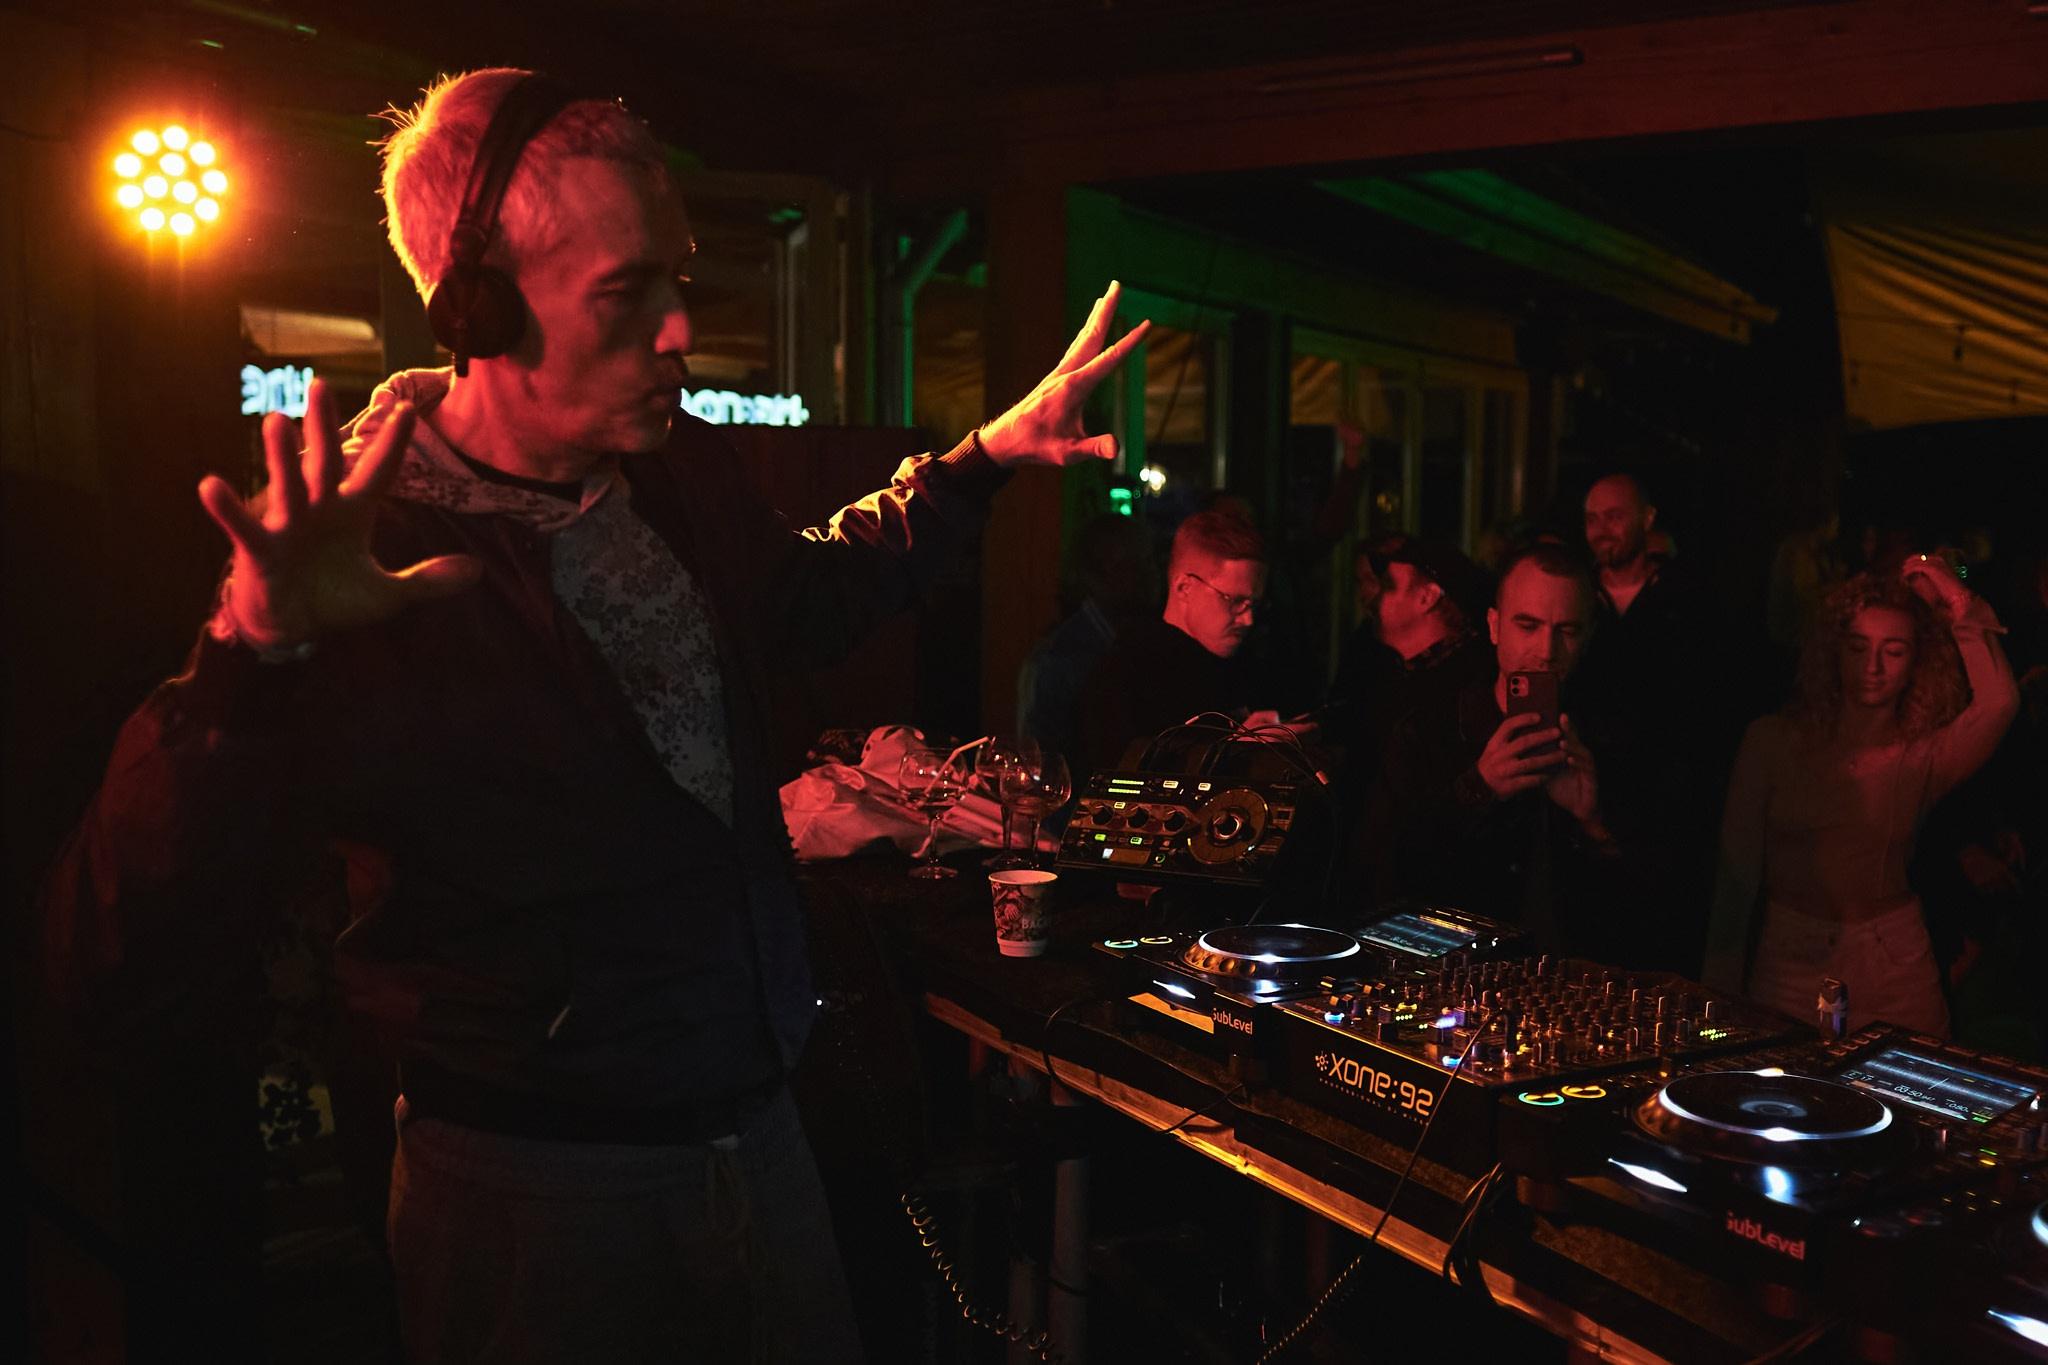 Микс дня: DJ T на вечеринке The Room Avantgarden